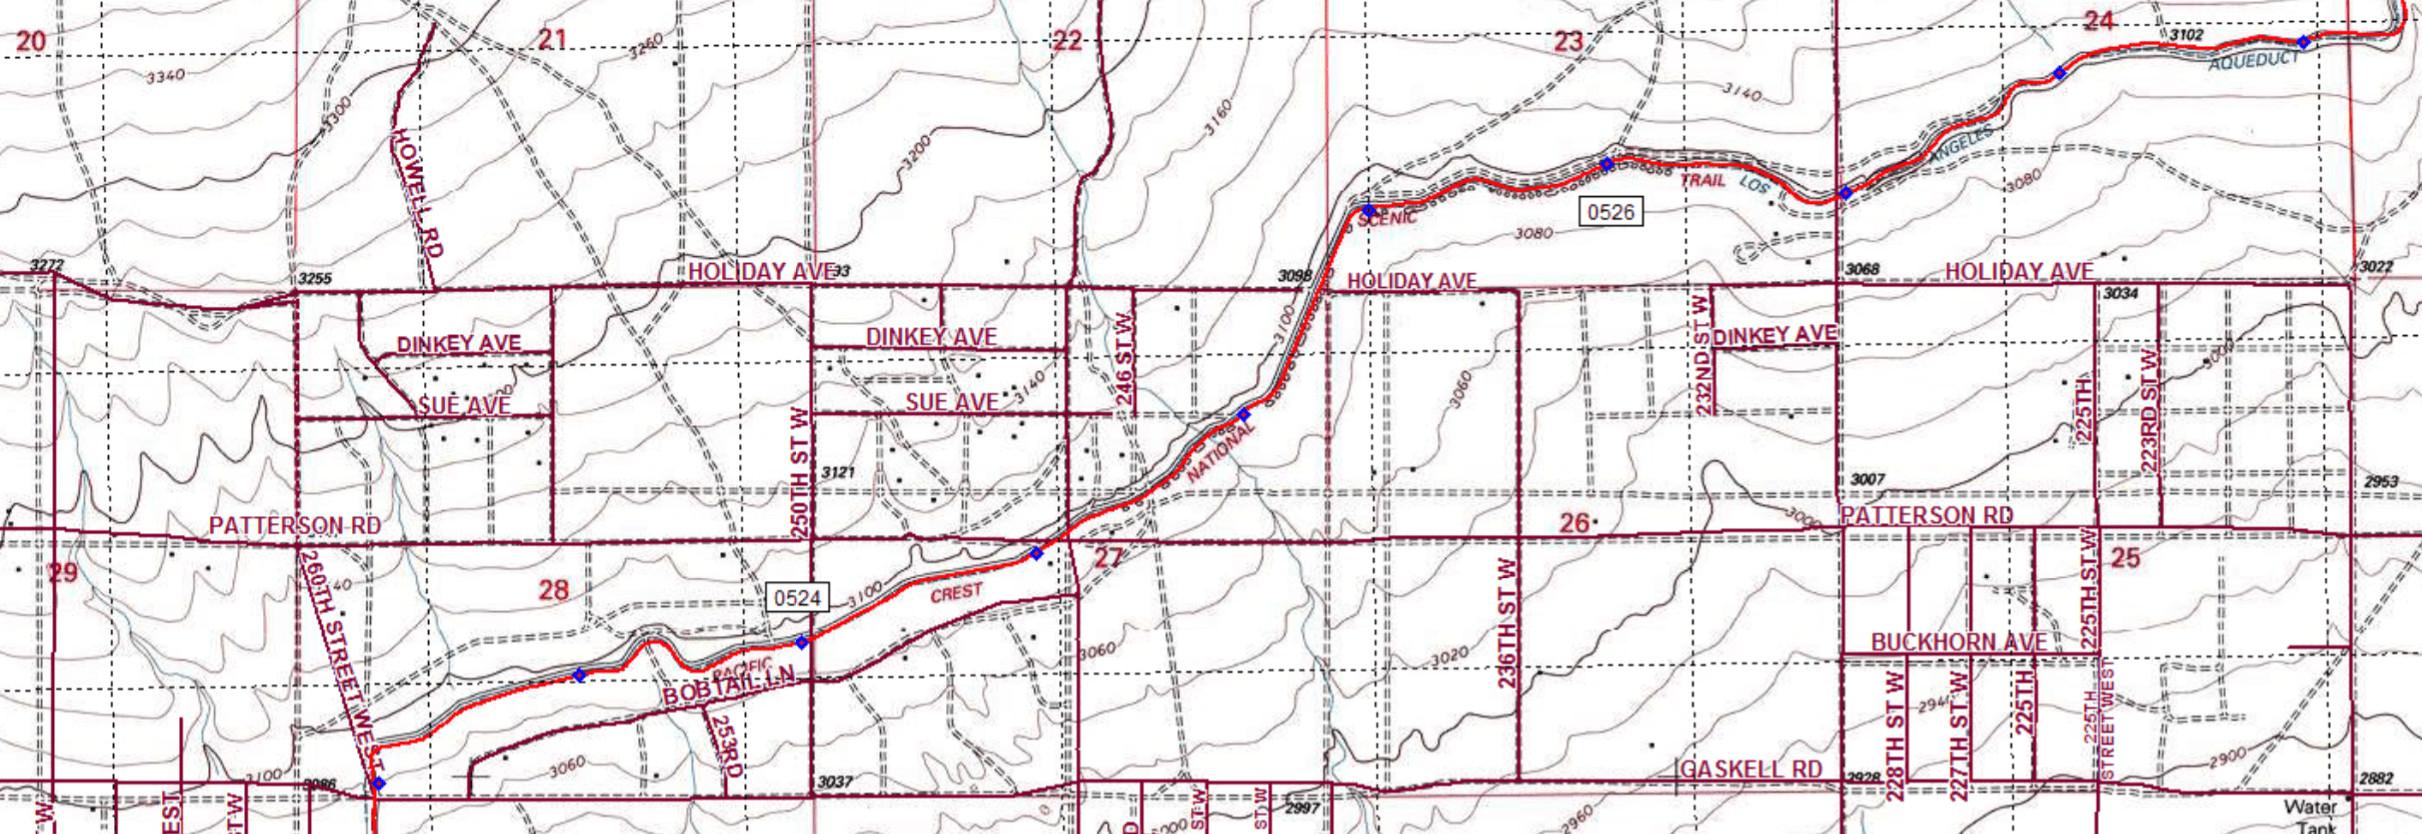 California Aqueduct Fishing Map Free Printable Best Section Hikes - California Aqueduct Fishing Map